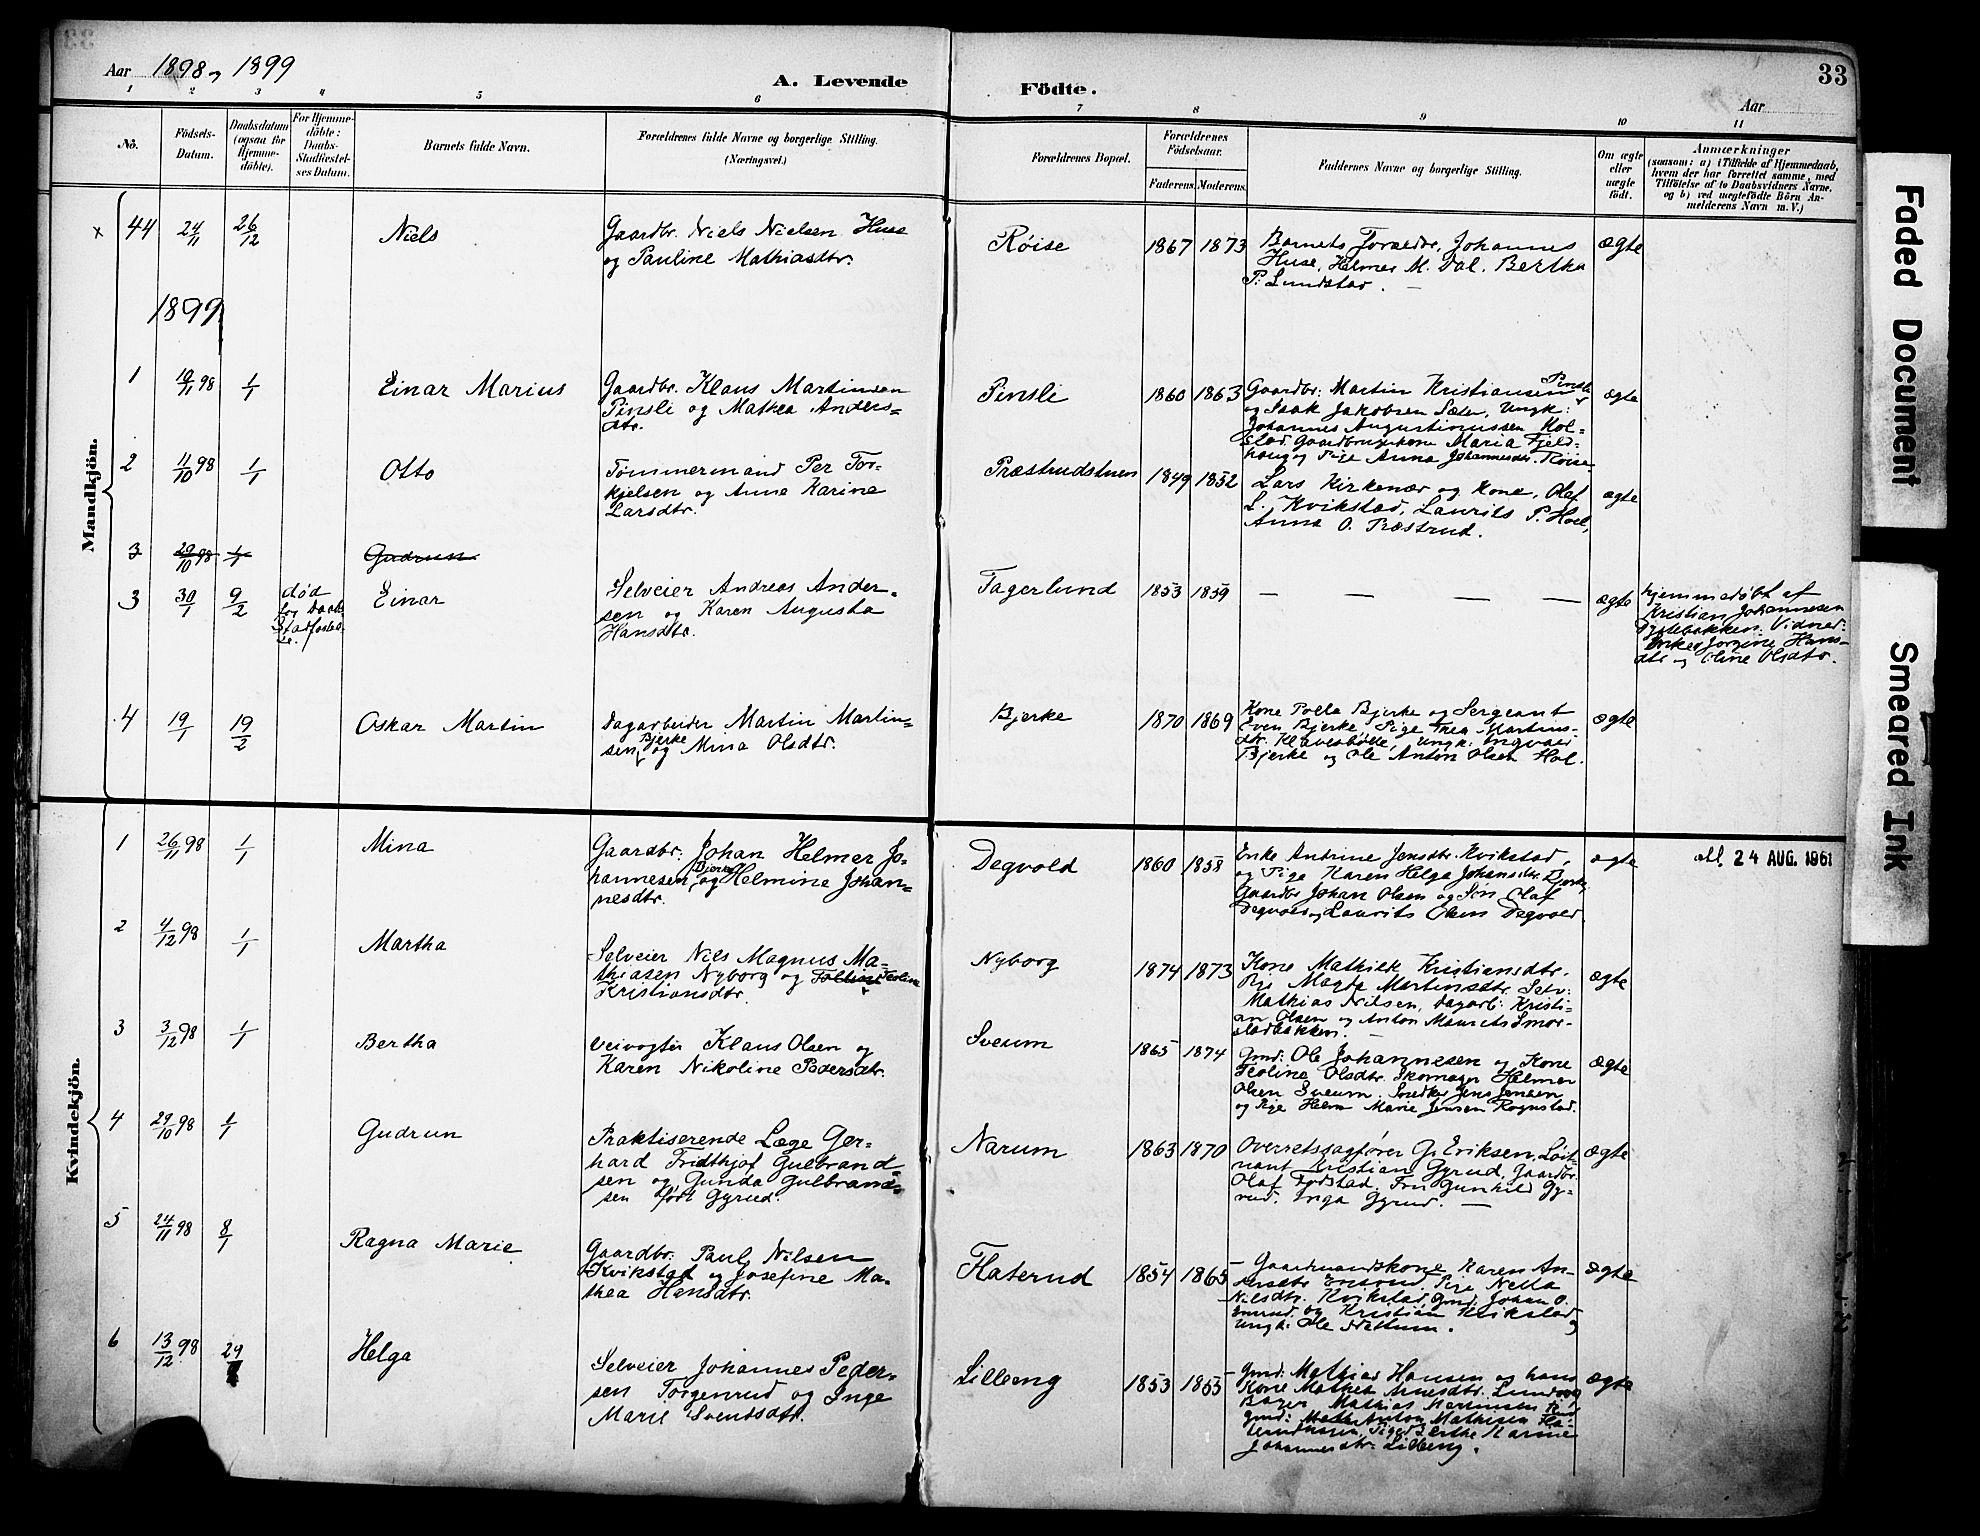 SAH, Vestre Toten prestekontor, H/Ha/Haa/L0013: Ministerialbok nr. 13, 1895-1911, s. 33